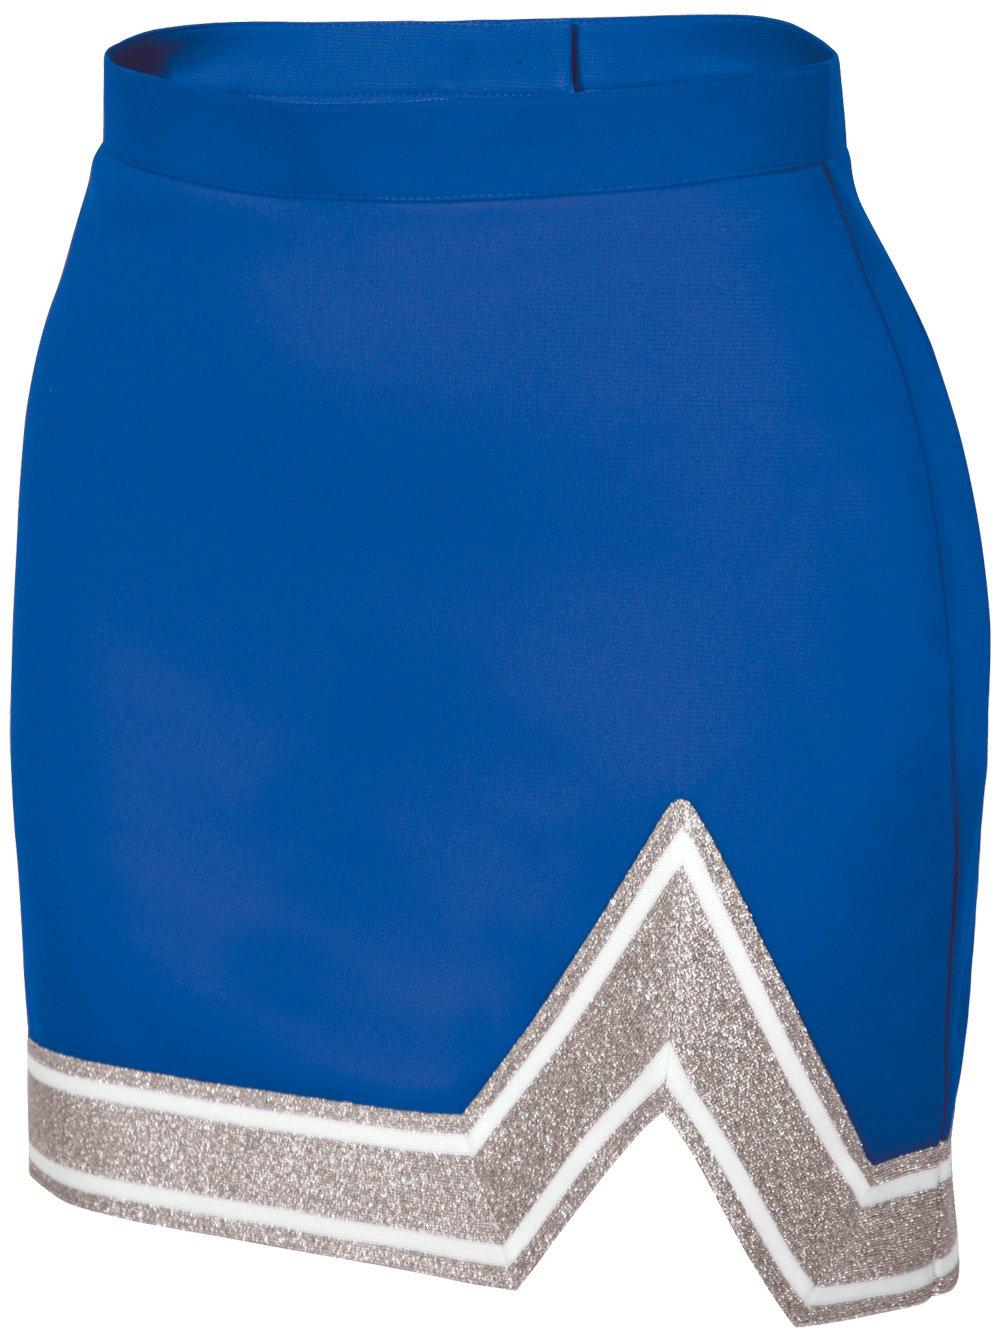 Chassé Womens' Blaze Skirt Royal/White/Metallic Silver Adult X-Small